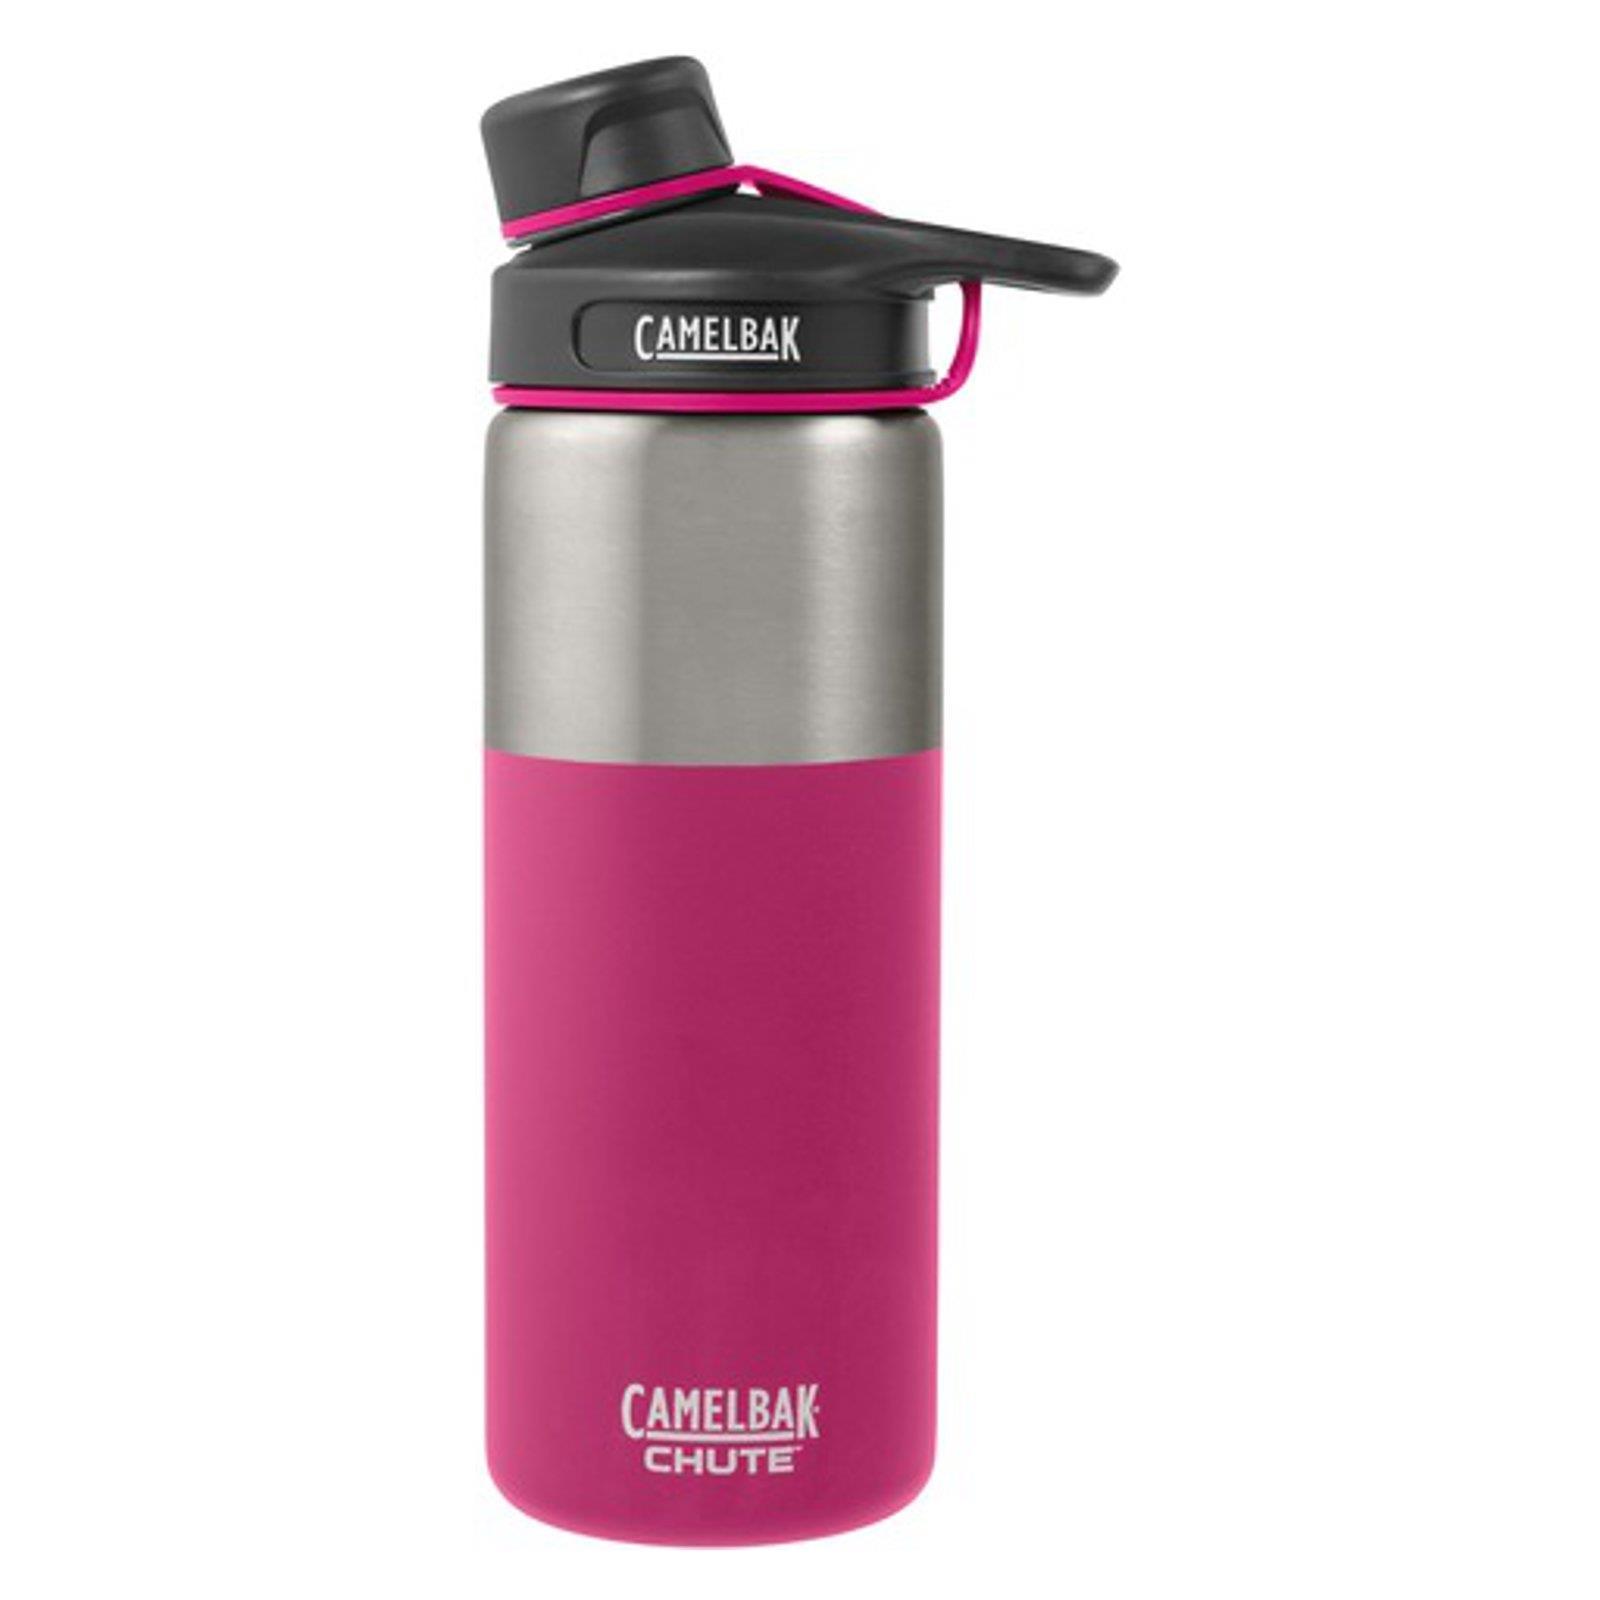 Camelbak-Trink-Isolier-Flasche-Chute-Vacuum-Thermo-Becher-Kanne-Outdoor Indexbild 20